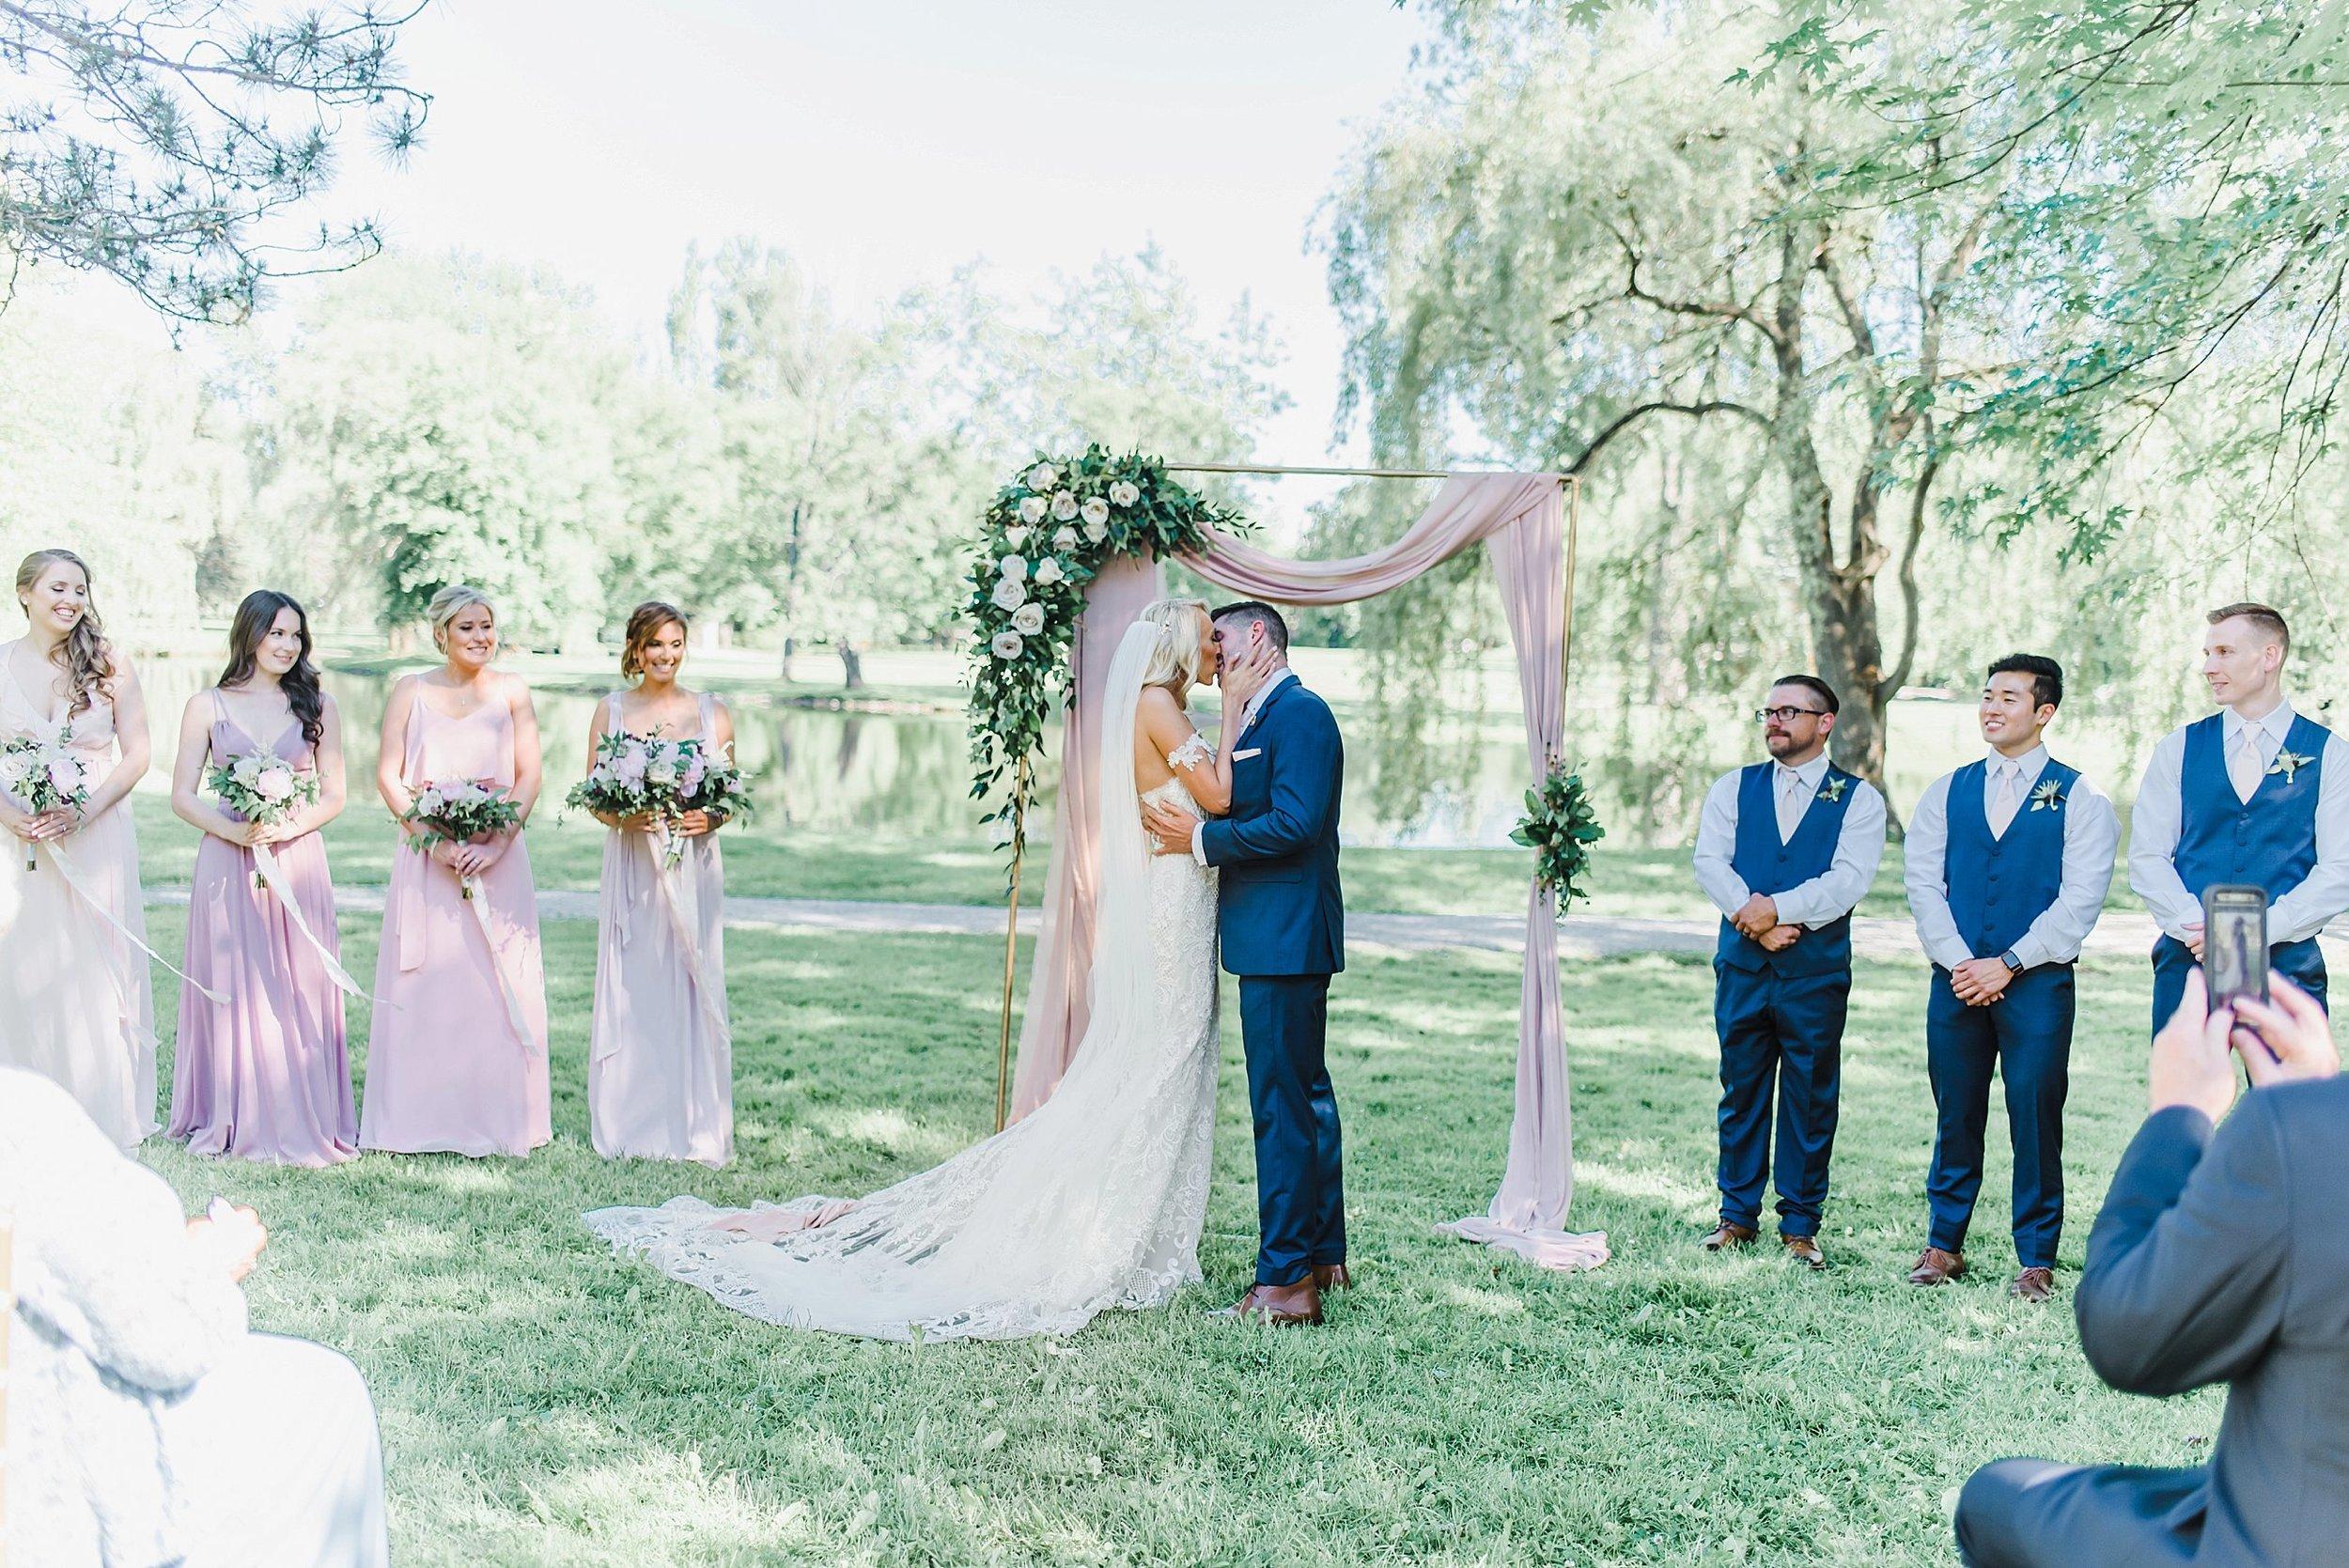 light airy indie fine art ottawa wedding photographer | Ali and Batoul Photography_0070.jpg